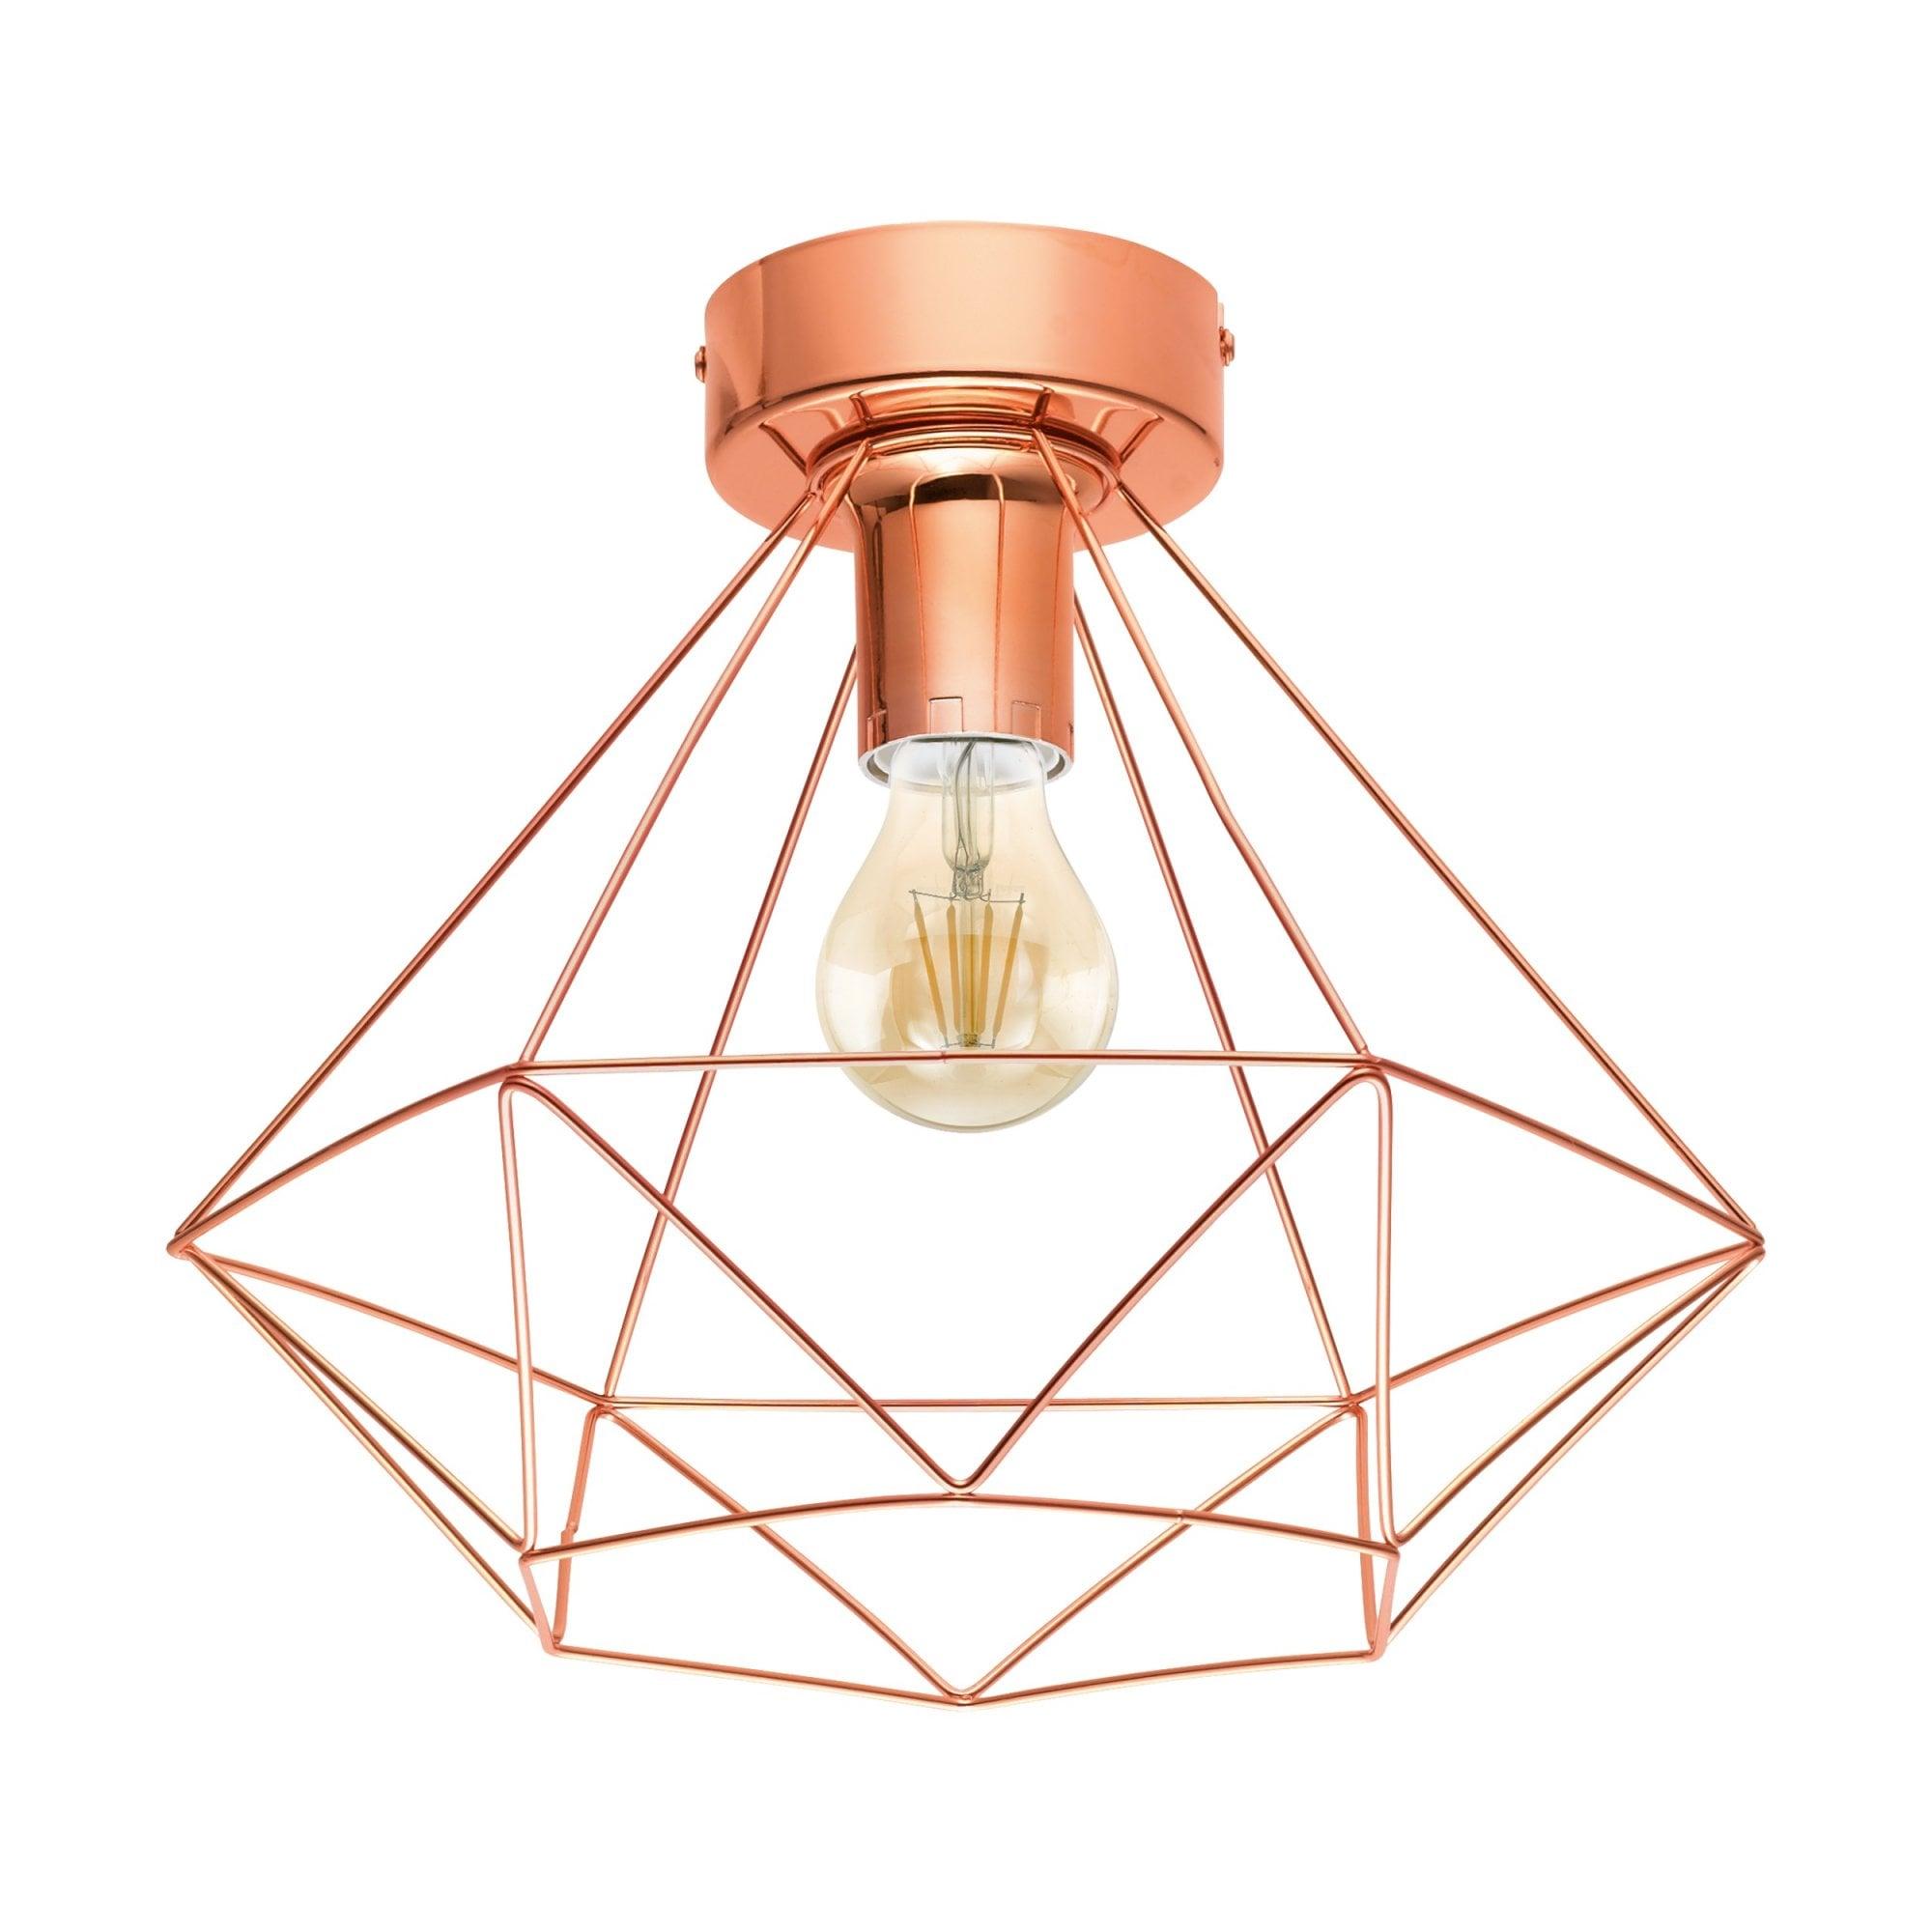 Picture of: Tarbes Semi Flush Ceiling Light In Copper Finish 43005 Lighting From The Home Lighting Centre Uk